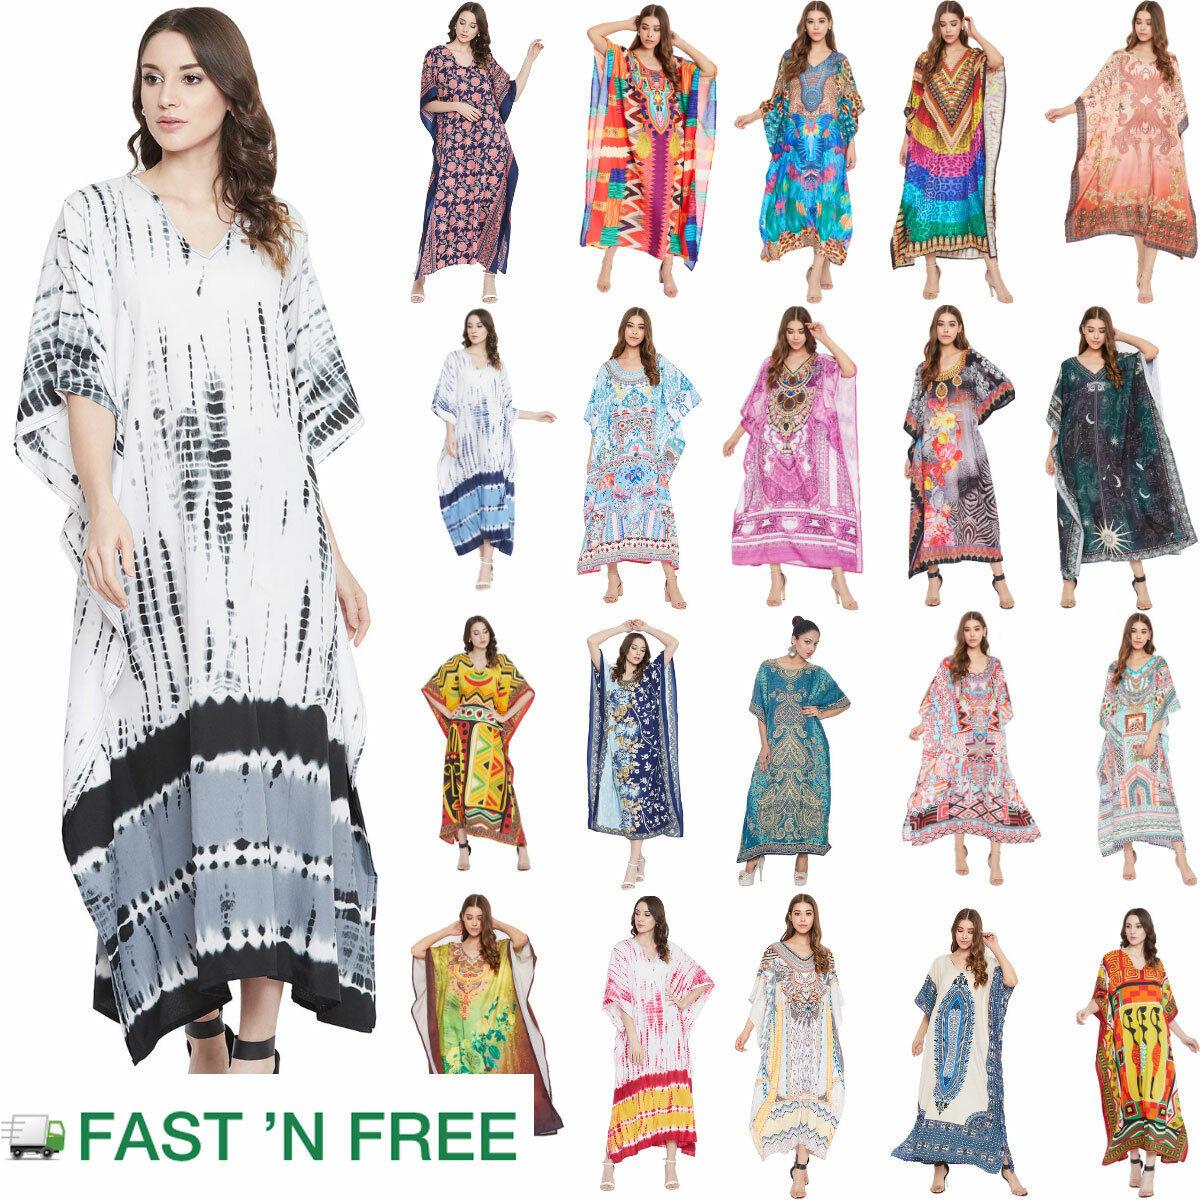 Women Boho Kaftan Kimono Maxi Dress Beach Holiday Plus Size Loose Long Sundress